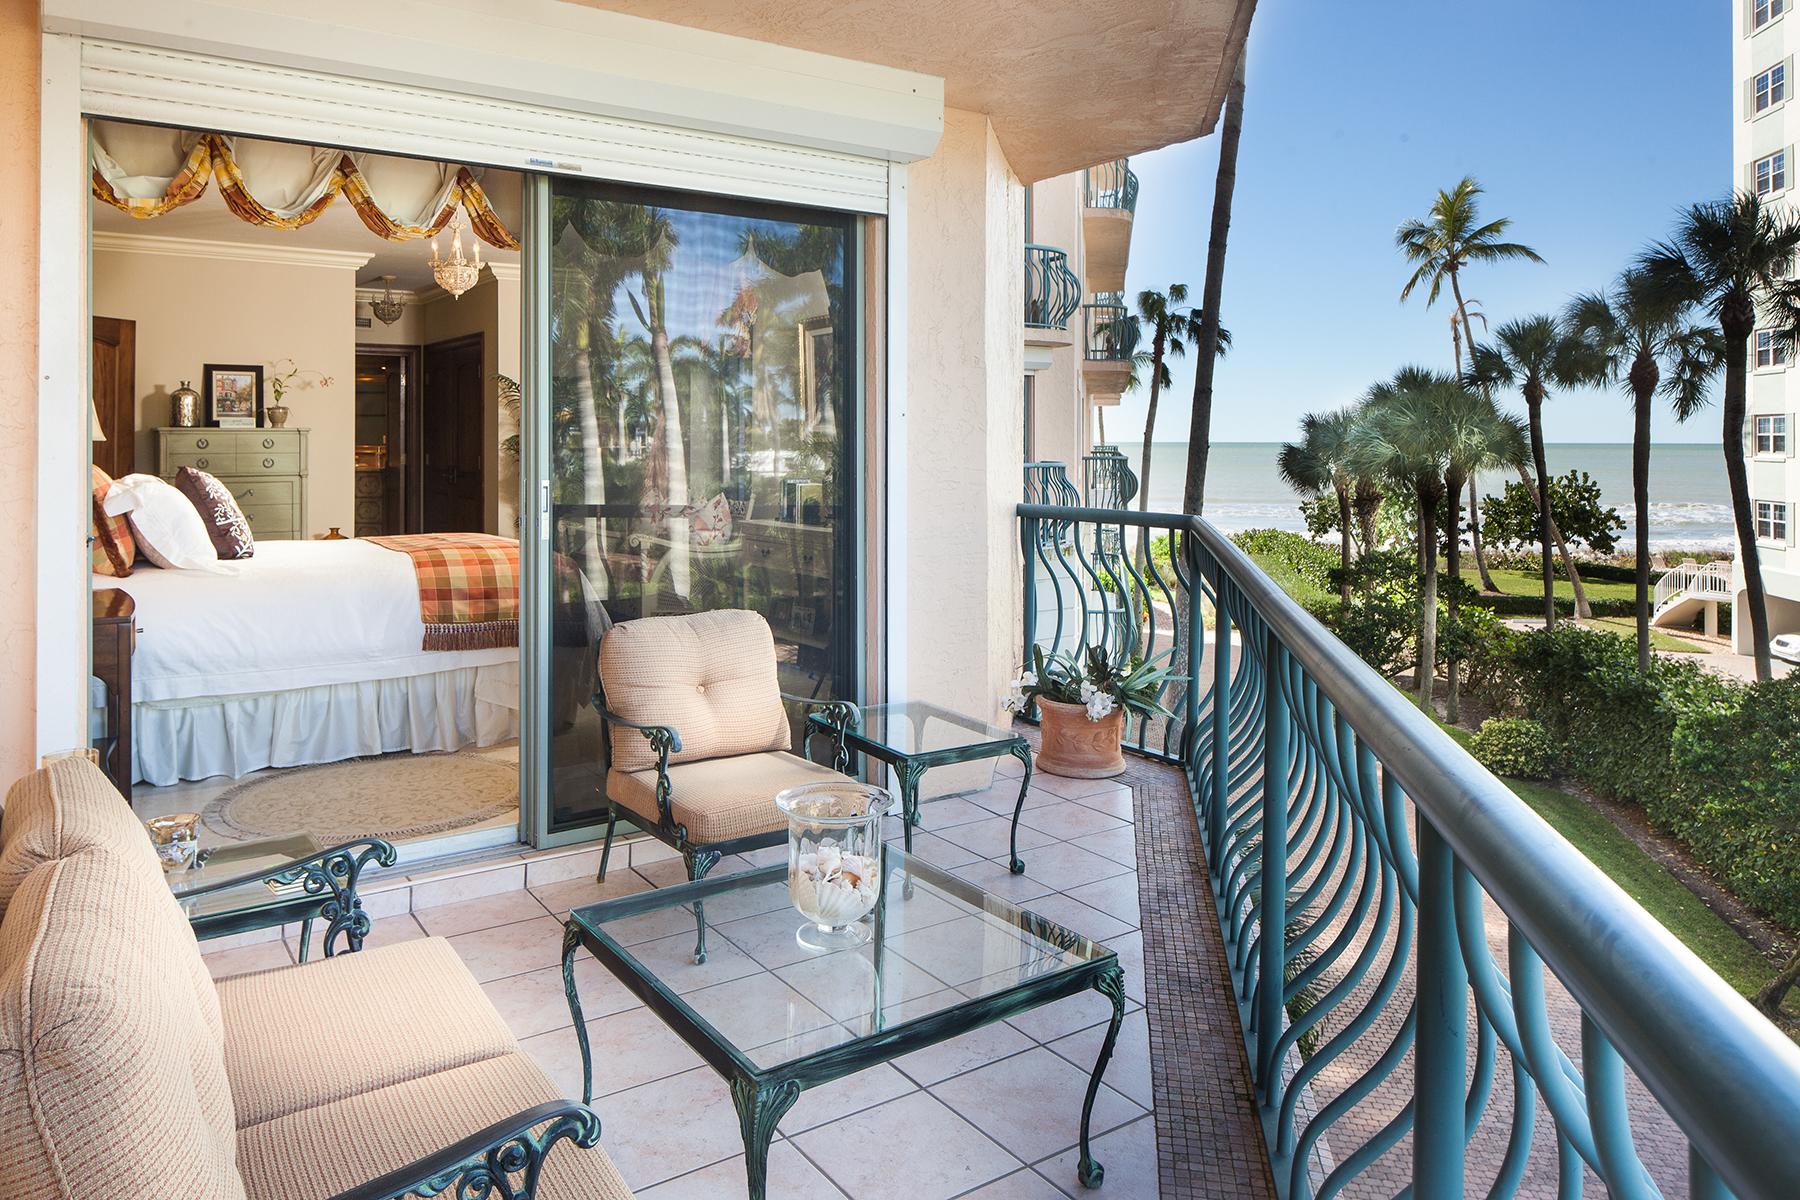 sales property at 1221 Gulf Shore Blvd N, 301, Naples, FL 34102